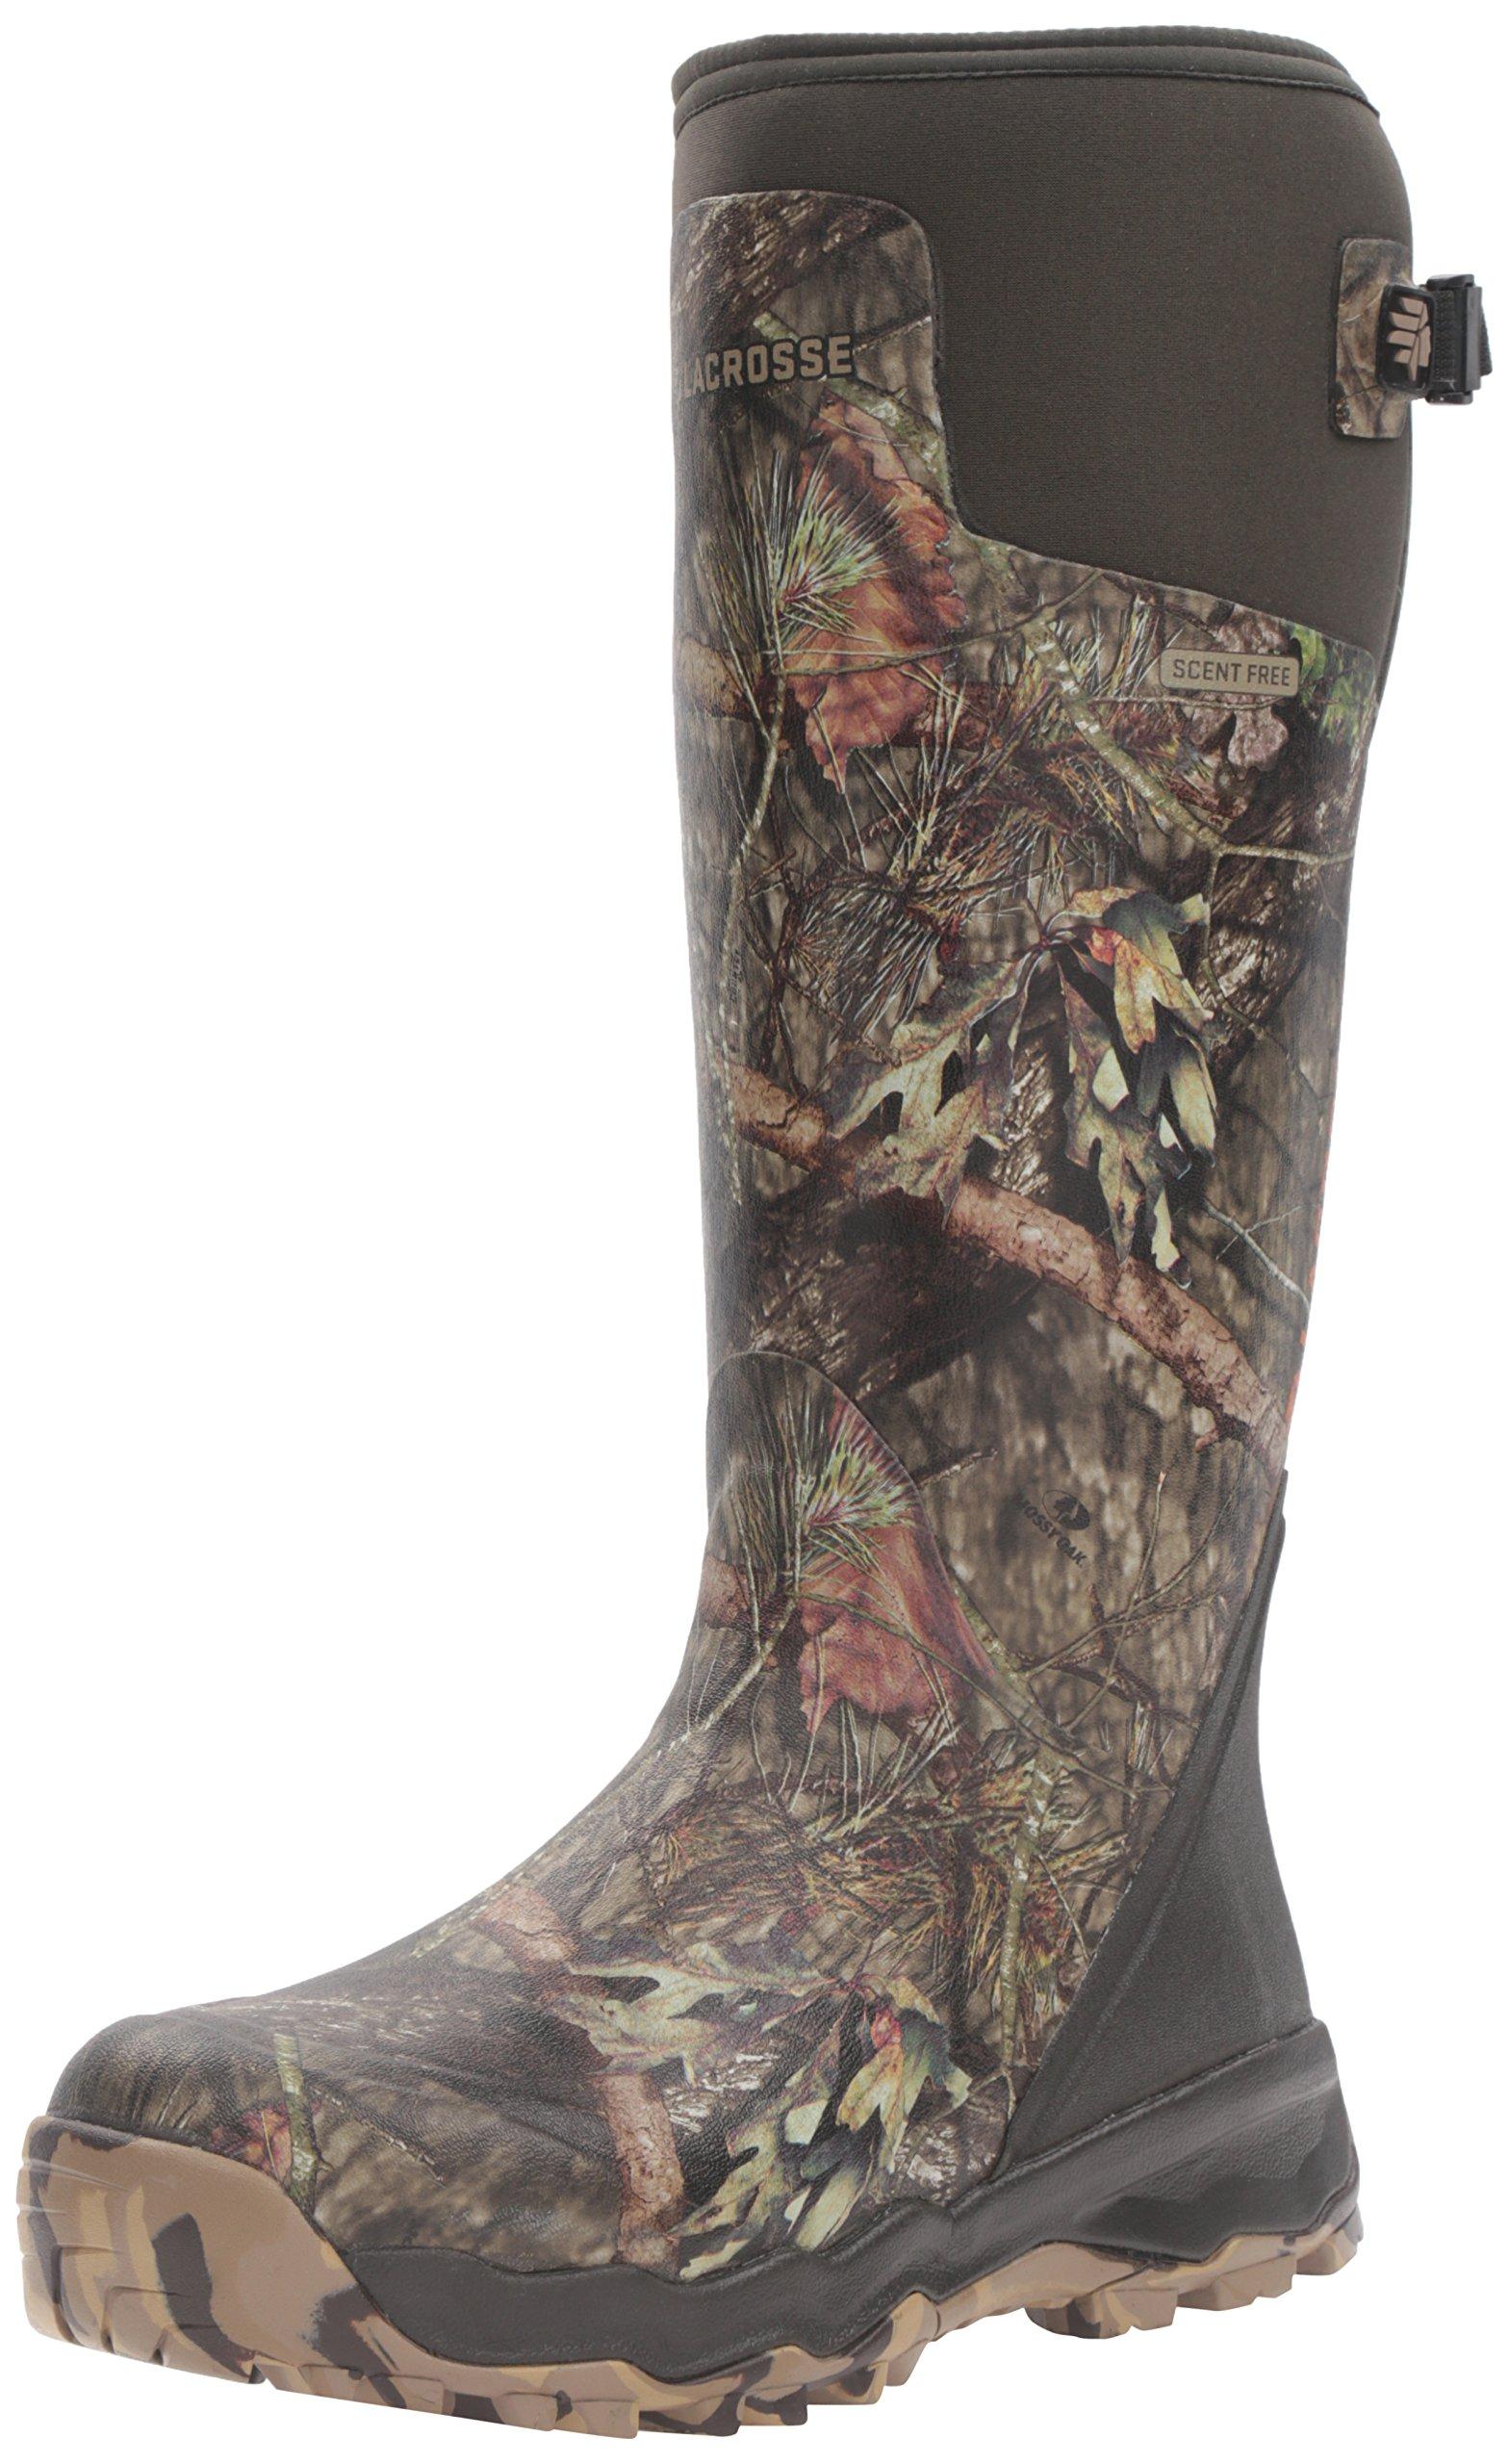 LaCrosse Men's Alphaburly Pro 18'' Hunting Shoes, Mossy Oak Break up Country, 9 M US